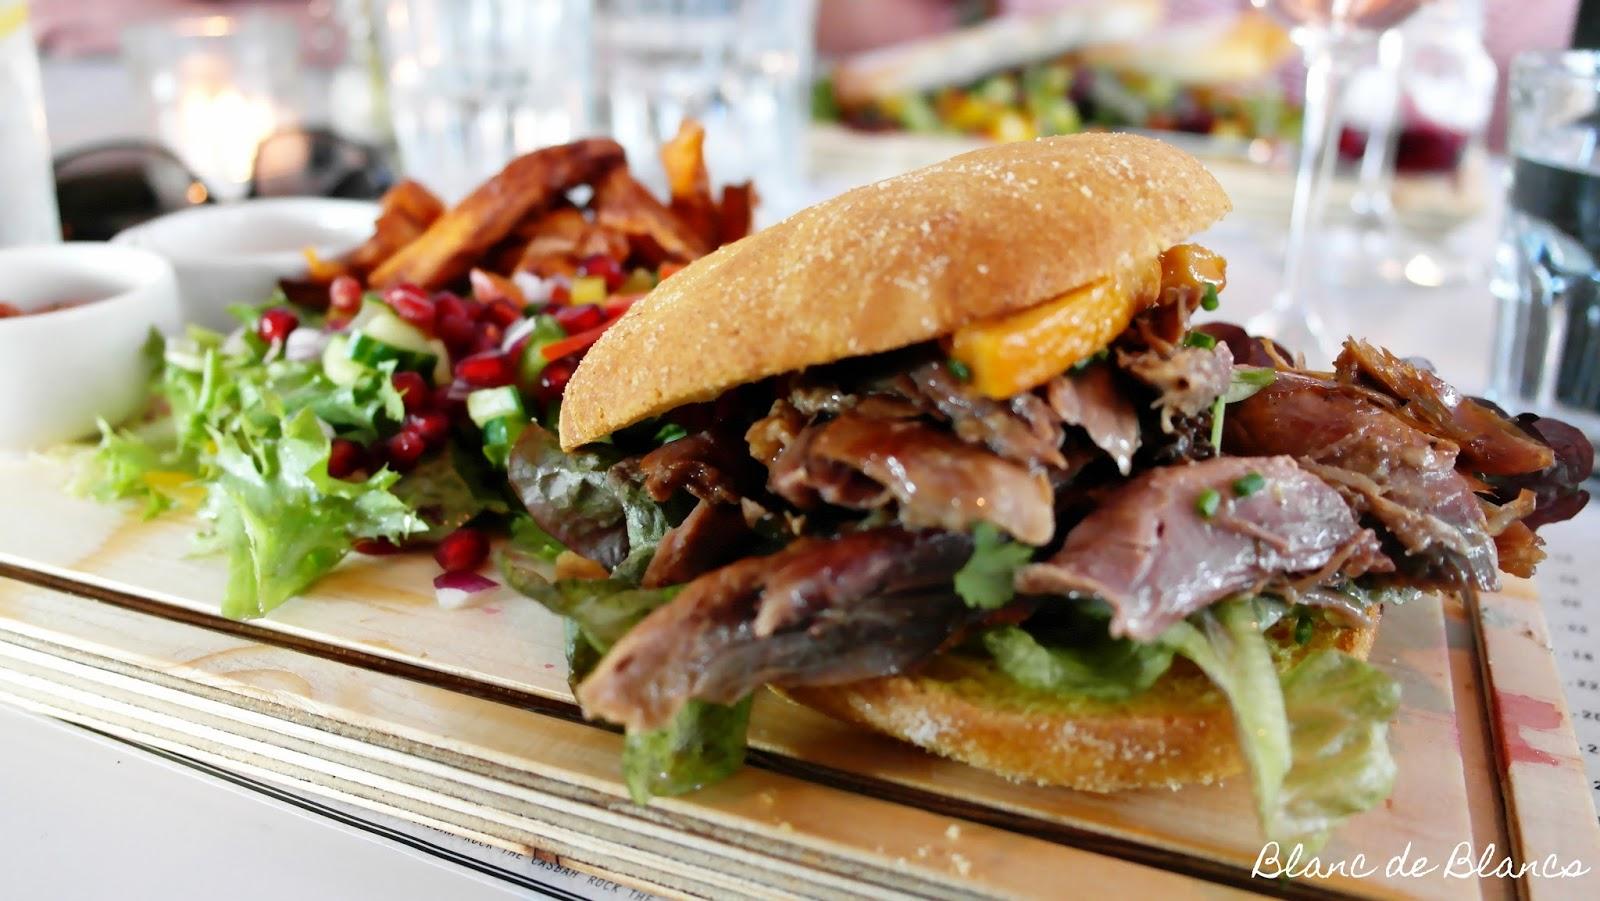 Sandron Batbout burger ankkaconfit-täytteellä - www.blancdeblancs.fi